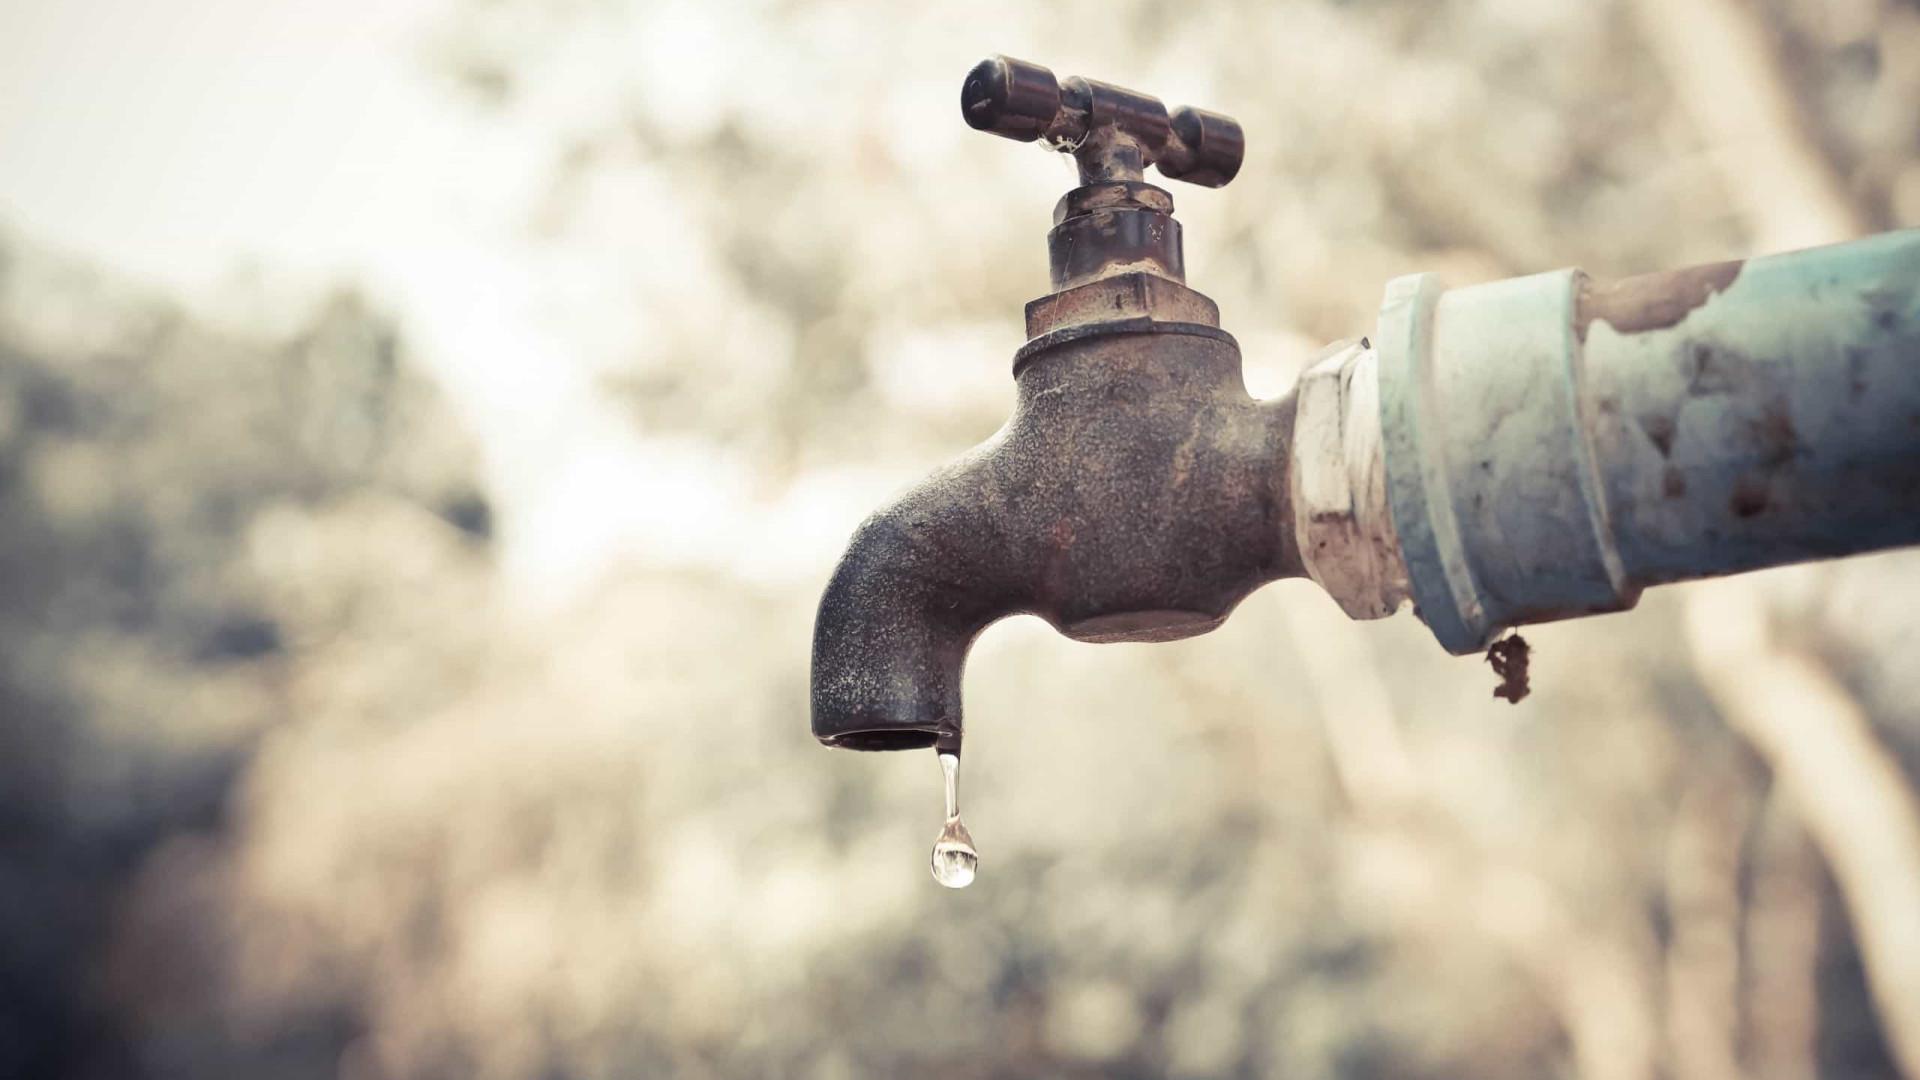 MP dá poderes a governo para adotar medidas emergenciais contra crise hídrica